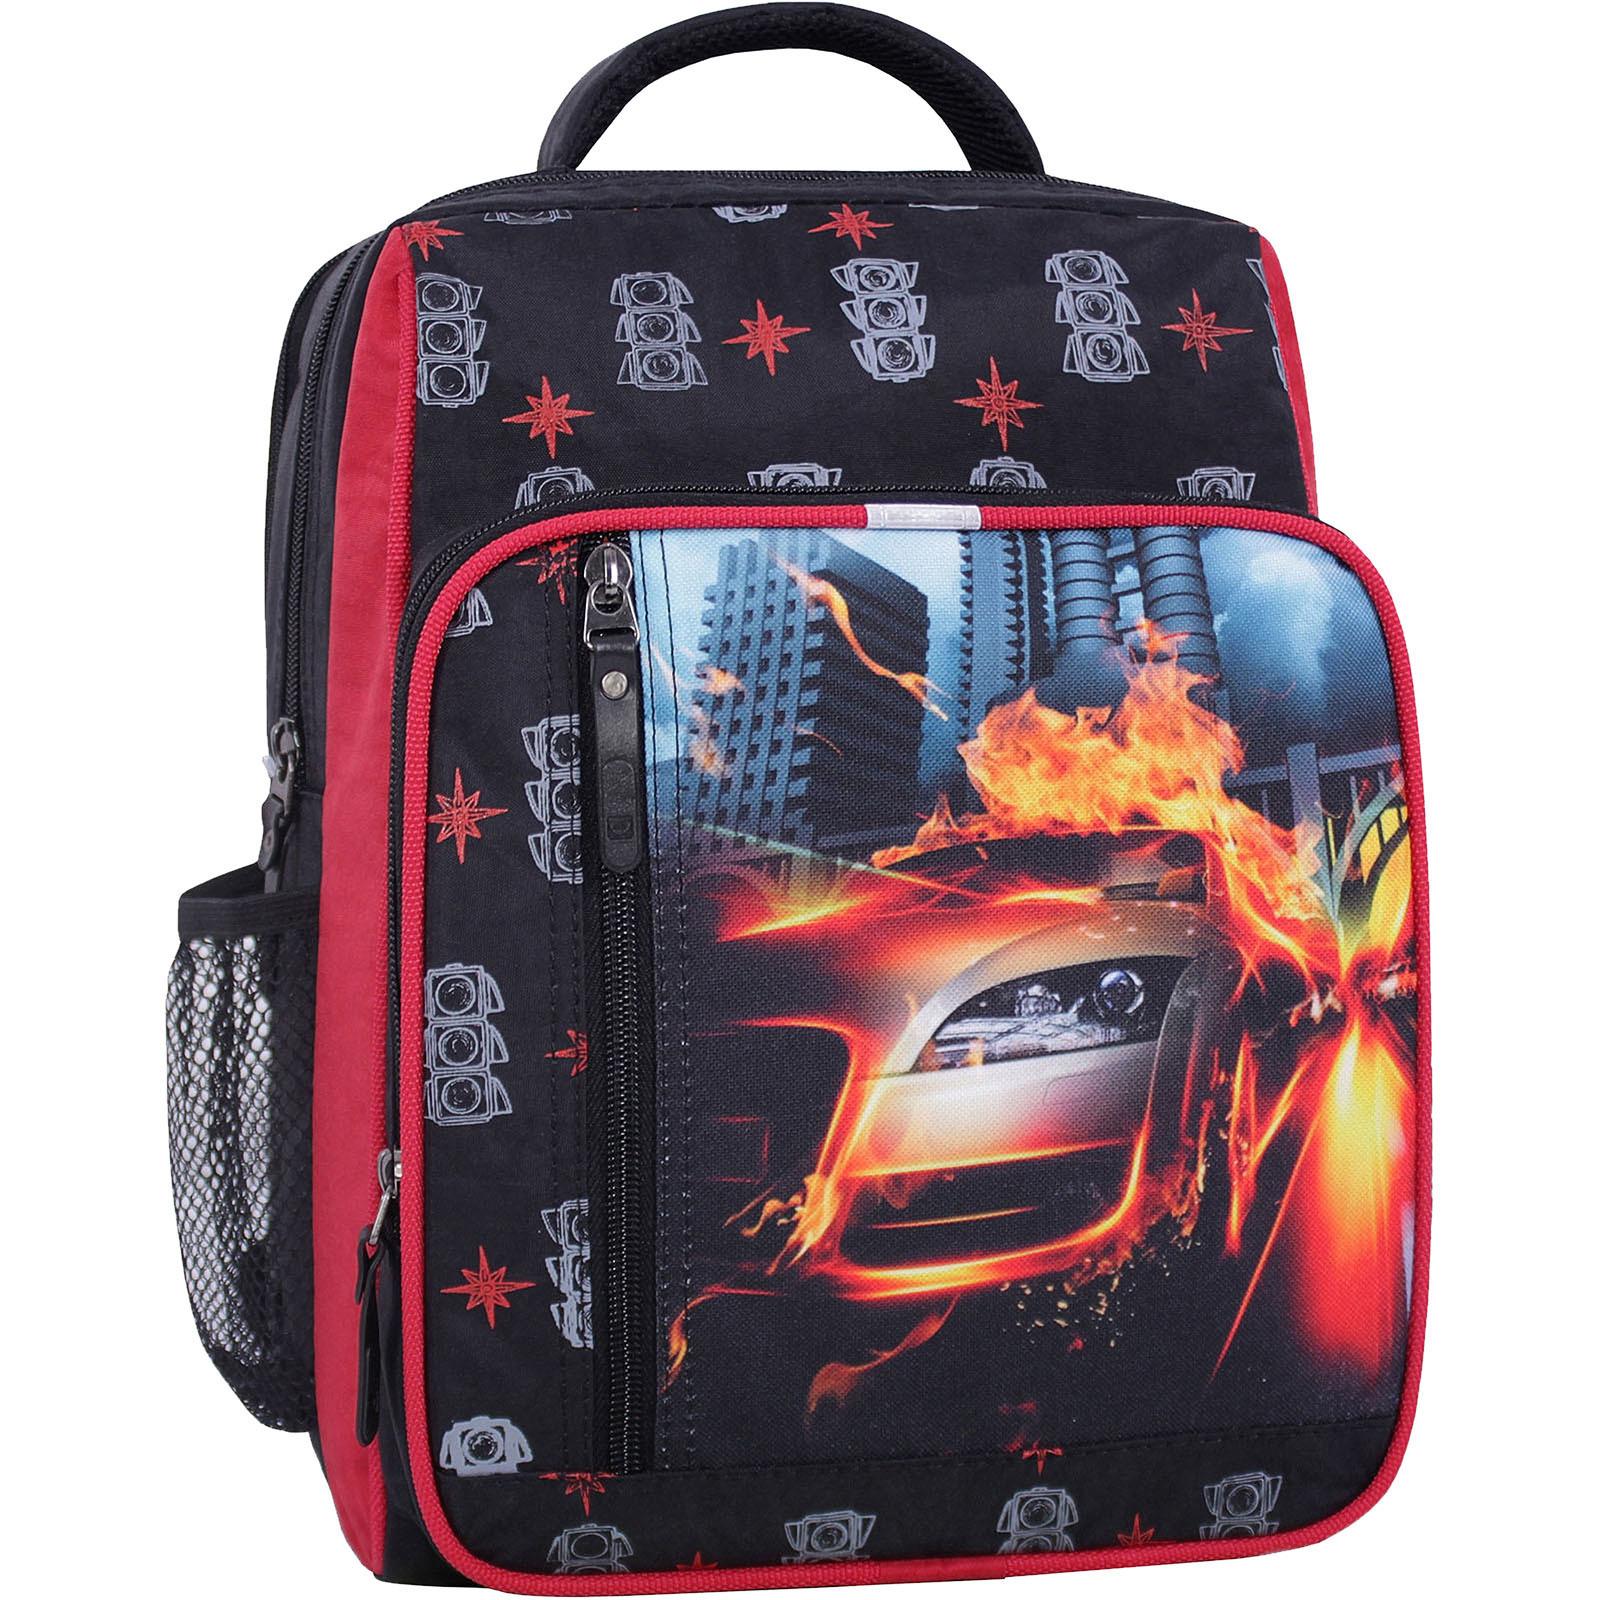 Школьные рюкзаки Рюкзак школьный Bagland Школьник 8 л. черный 500 (00112702) IMG_1595_суб.500_.JPG